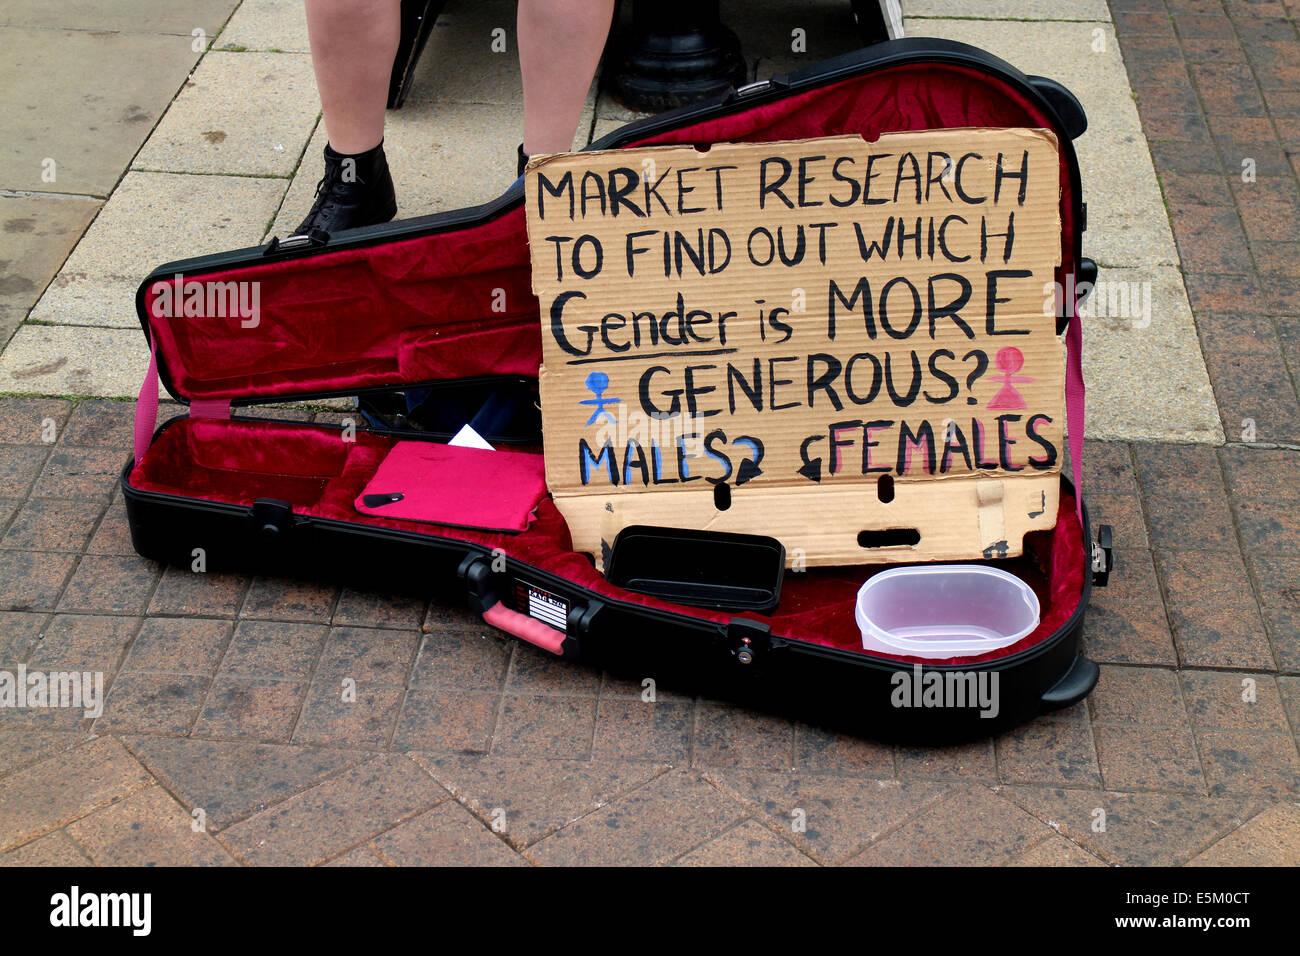 Busker's guitar case avec signe, Stratford-upon-Avon, Royaume-Uni Photo Stock